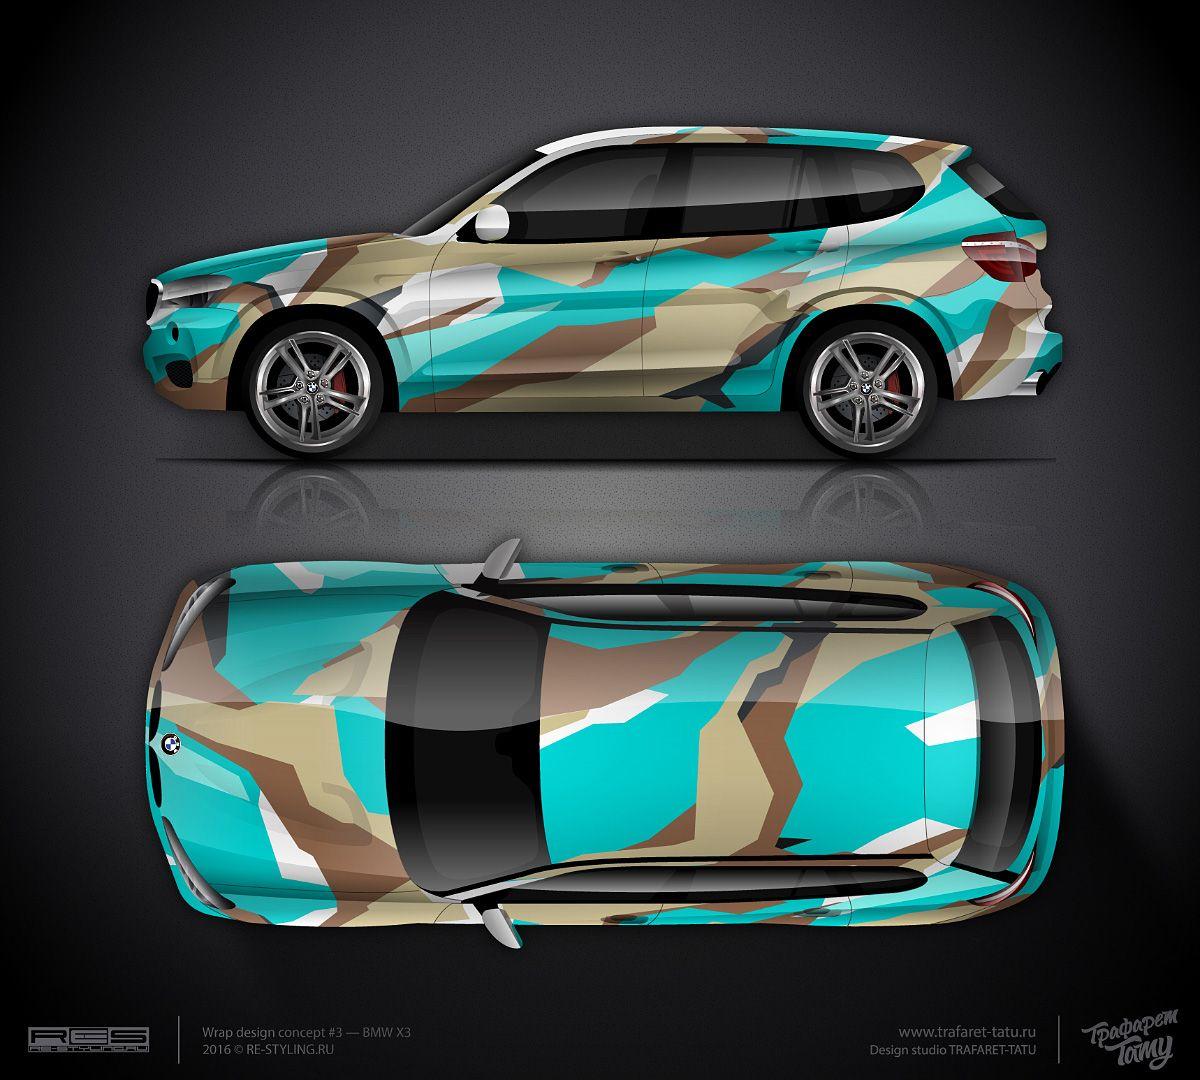 design consept 3 camo for sale car wrap design. Black Bedroom Furniture Sets. Home Design Ideas